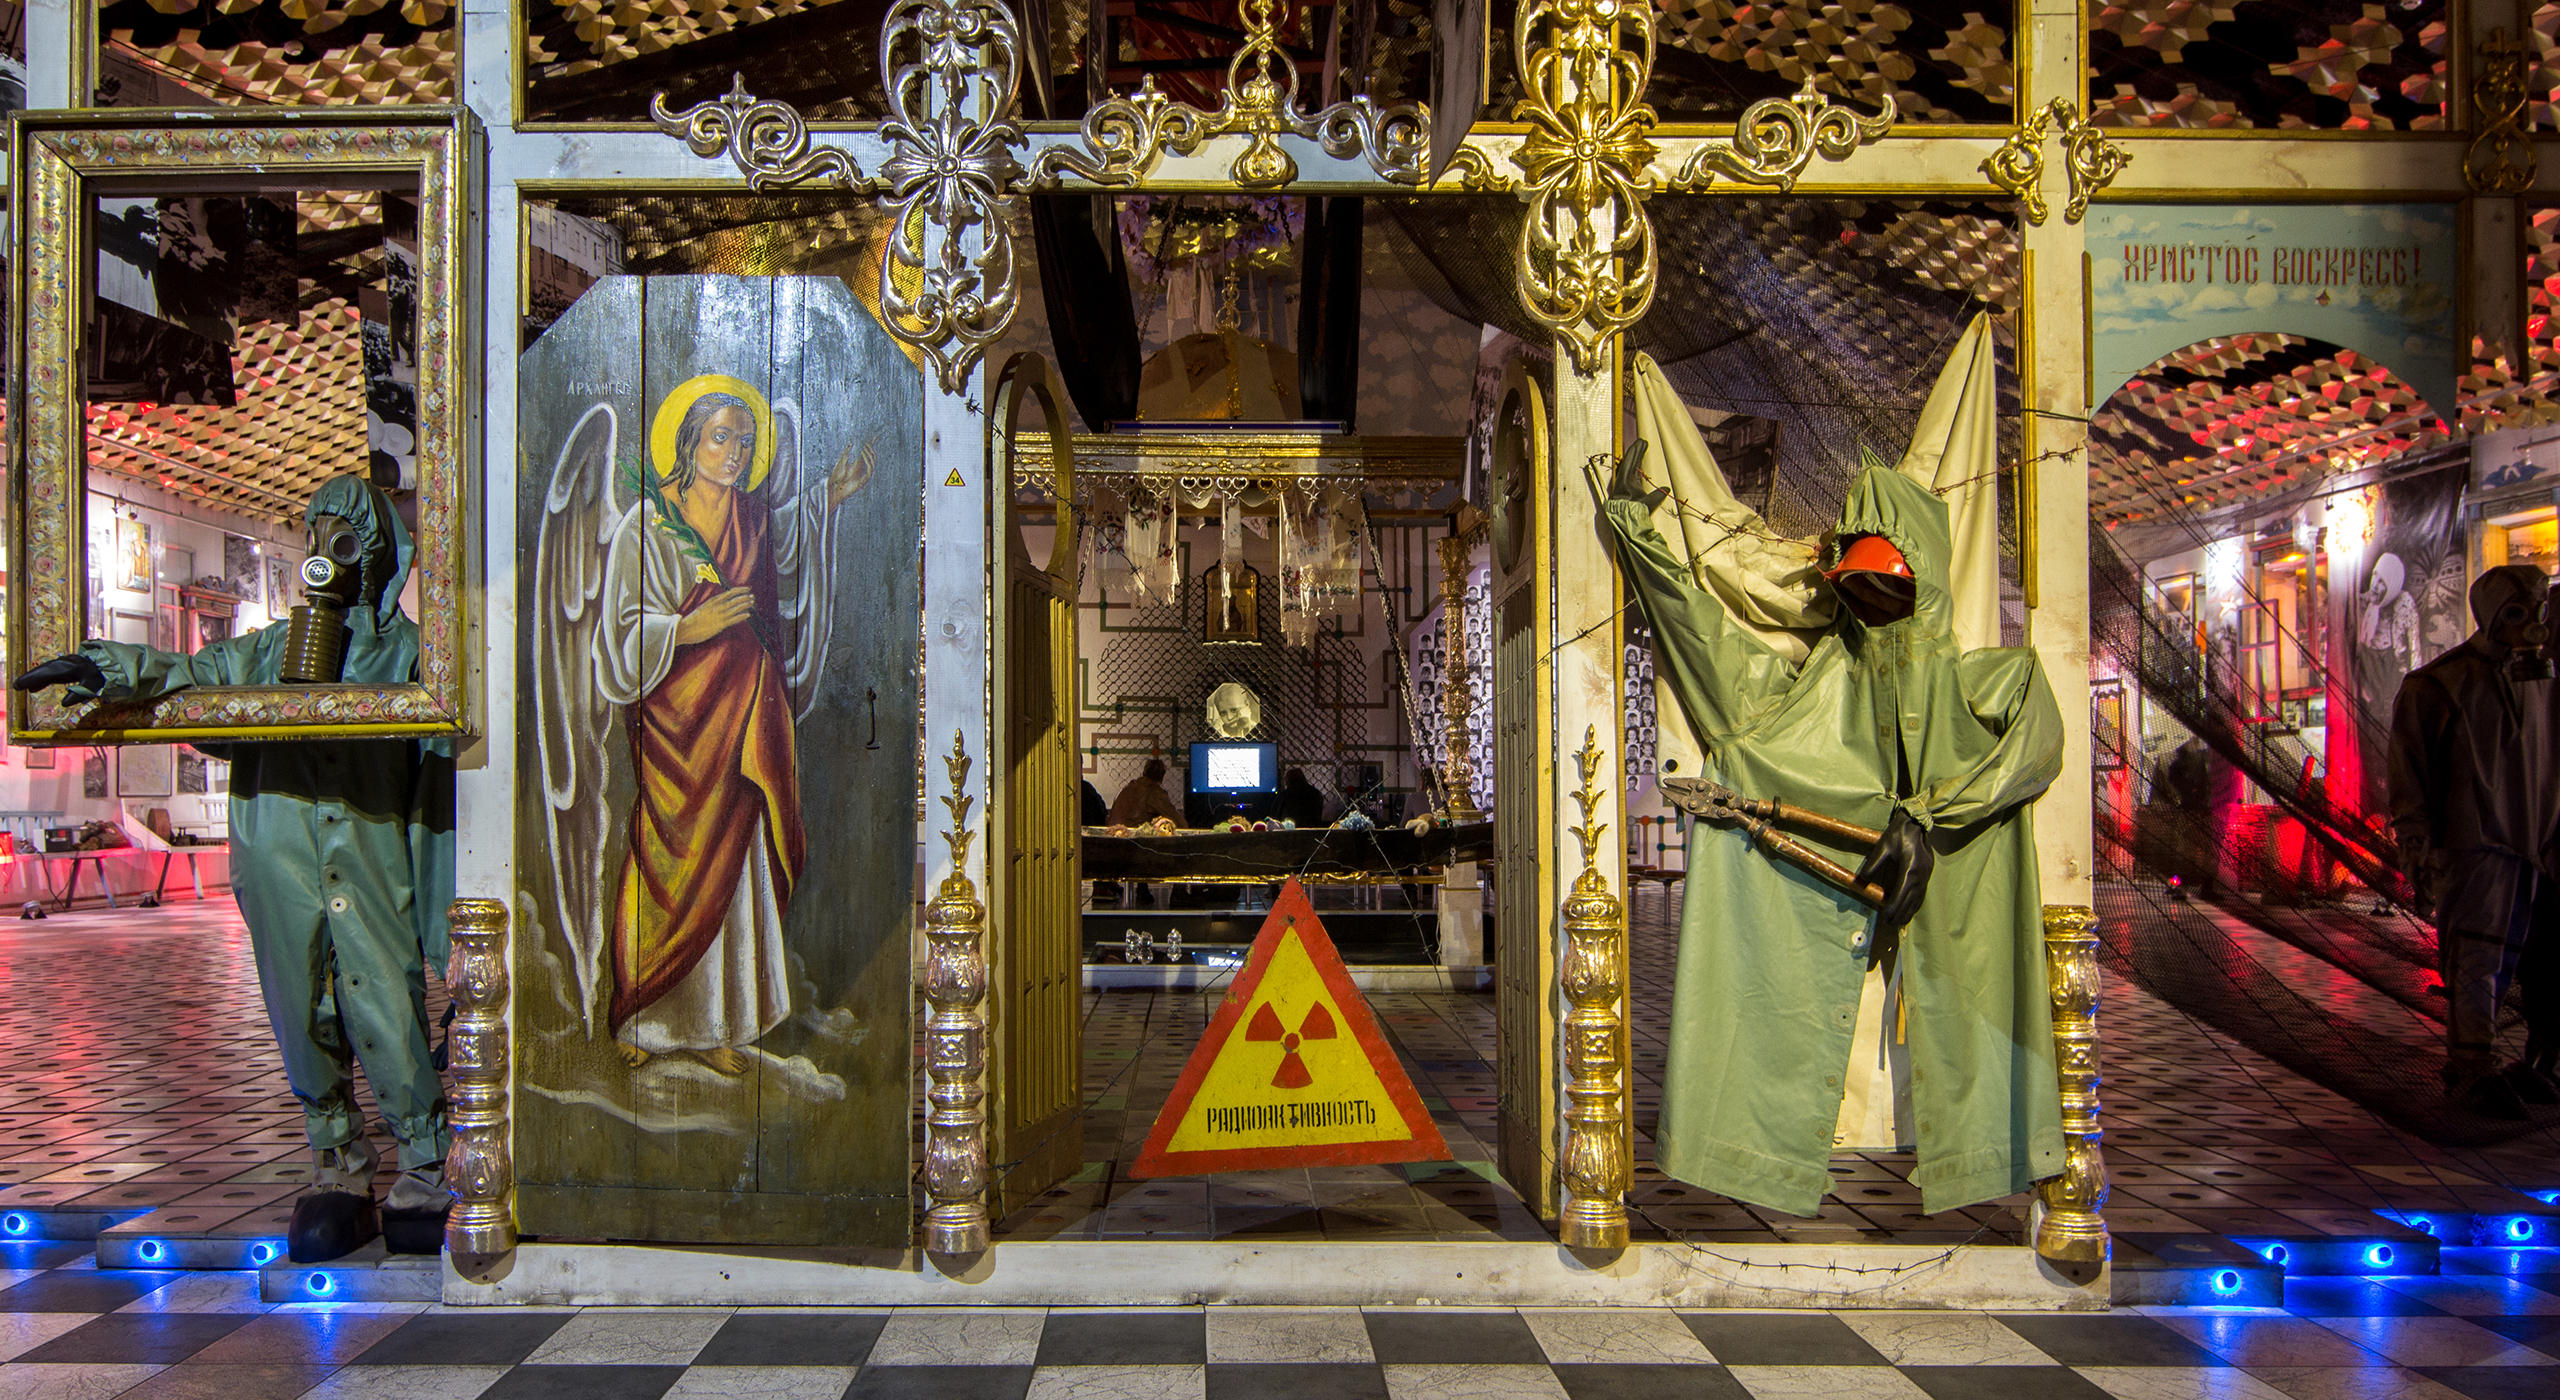 Ukrainian National Chernobyl Museum,places to visit in Kiev